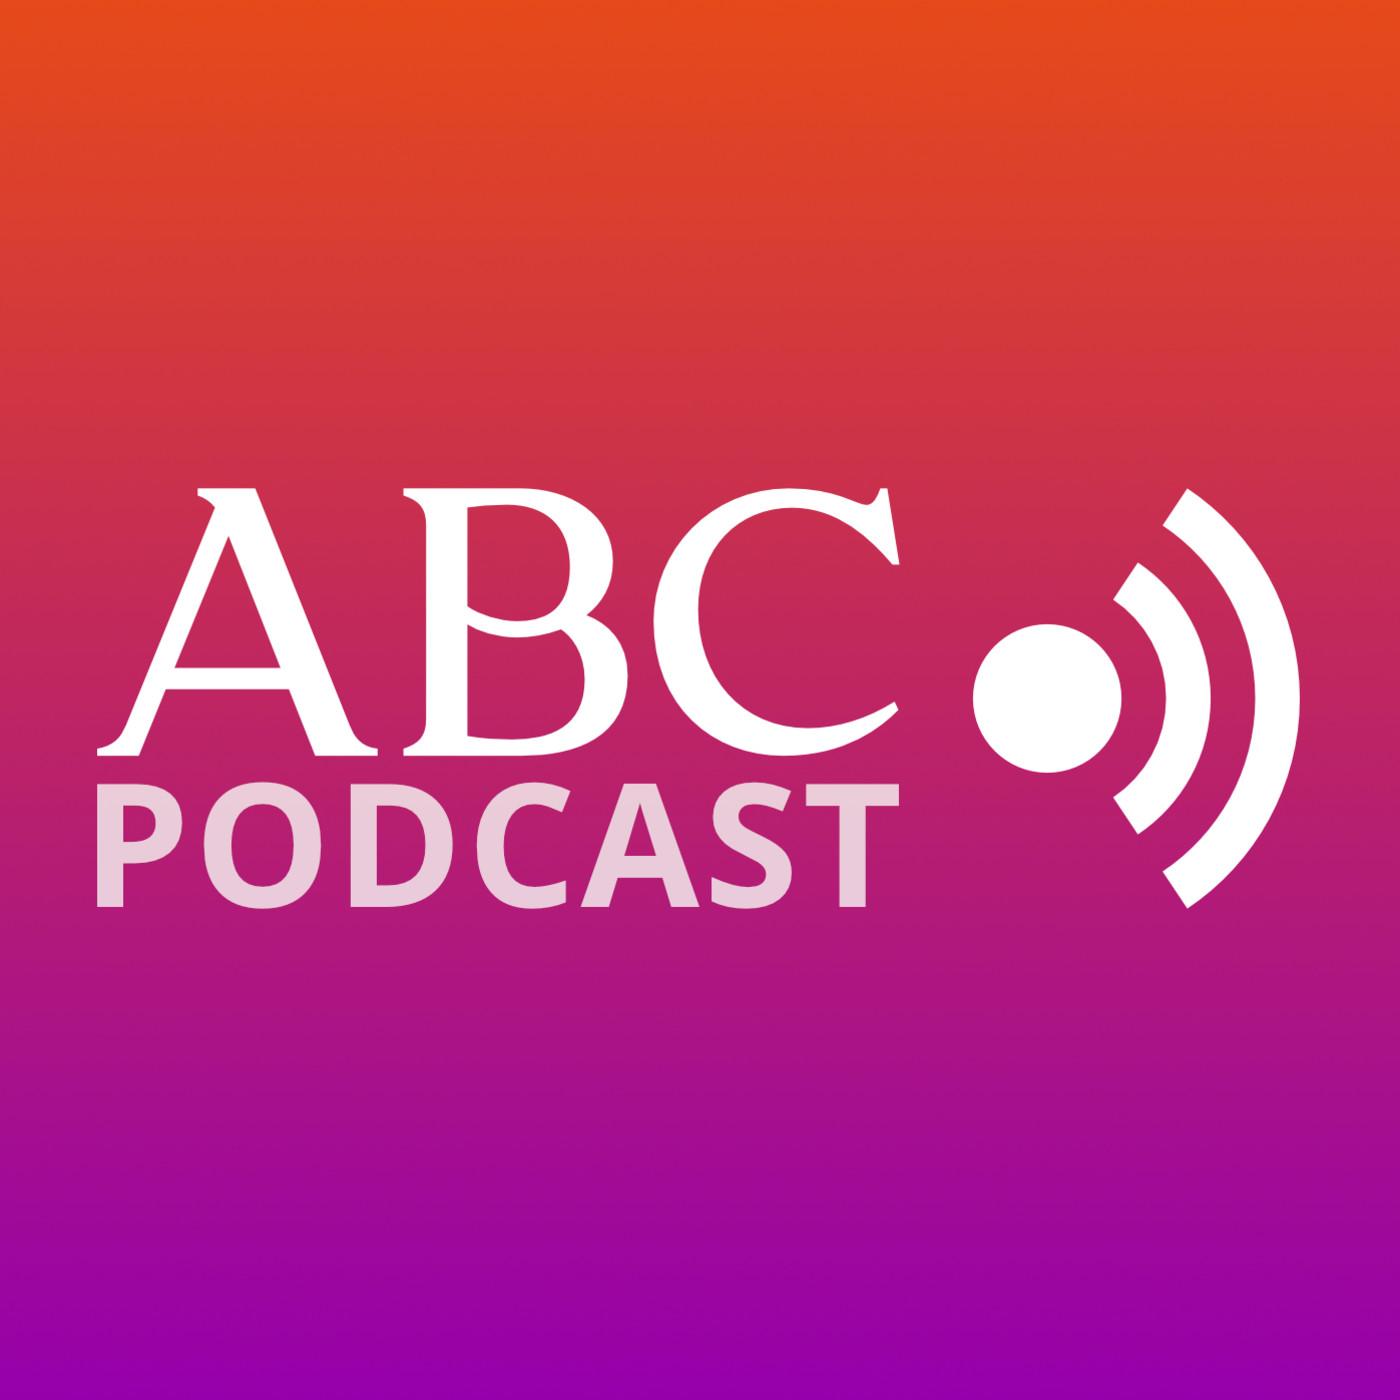 ABC Podcast